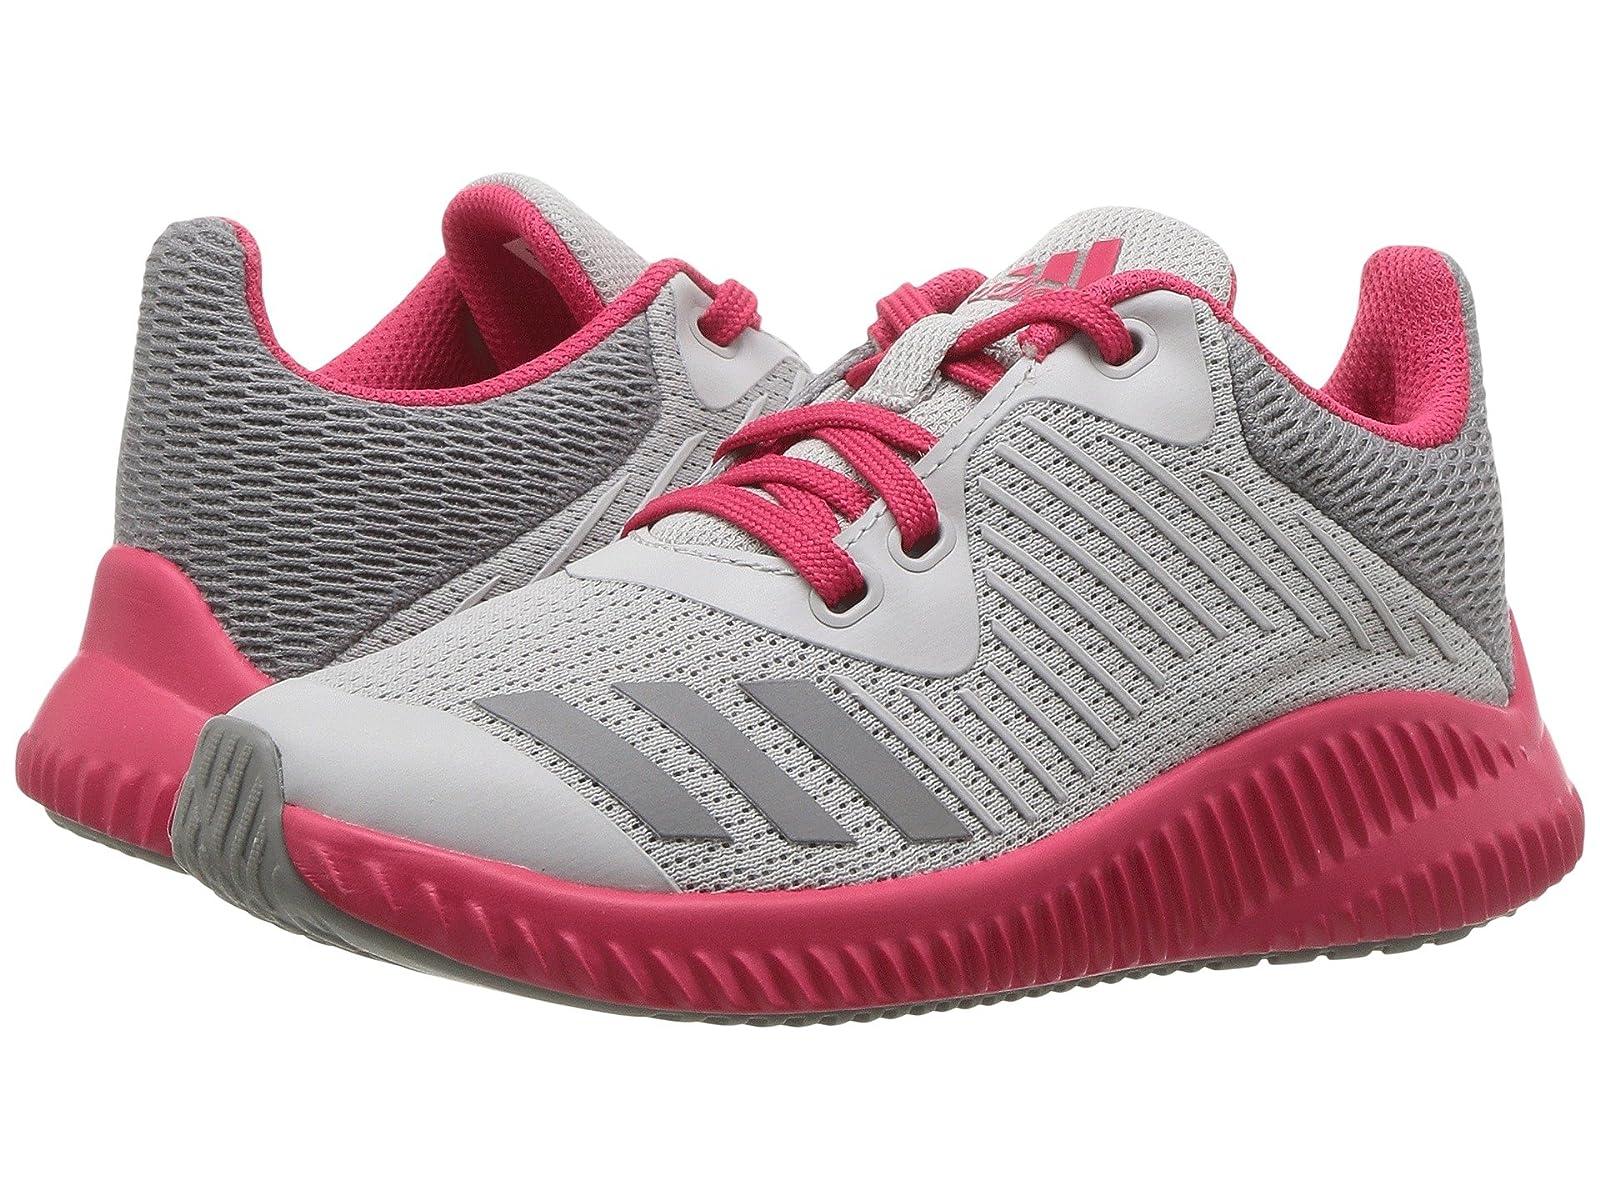 adidas Kids FortaRun K (Little Kid/Big Kid)Stylish and characteristic shoes